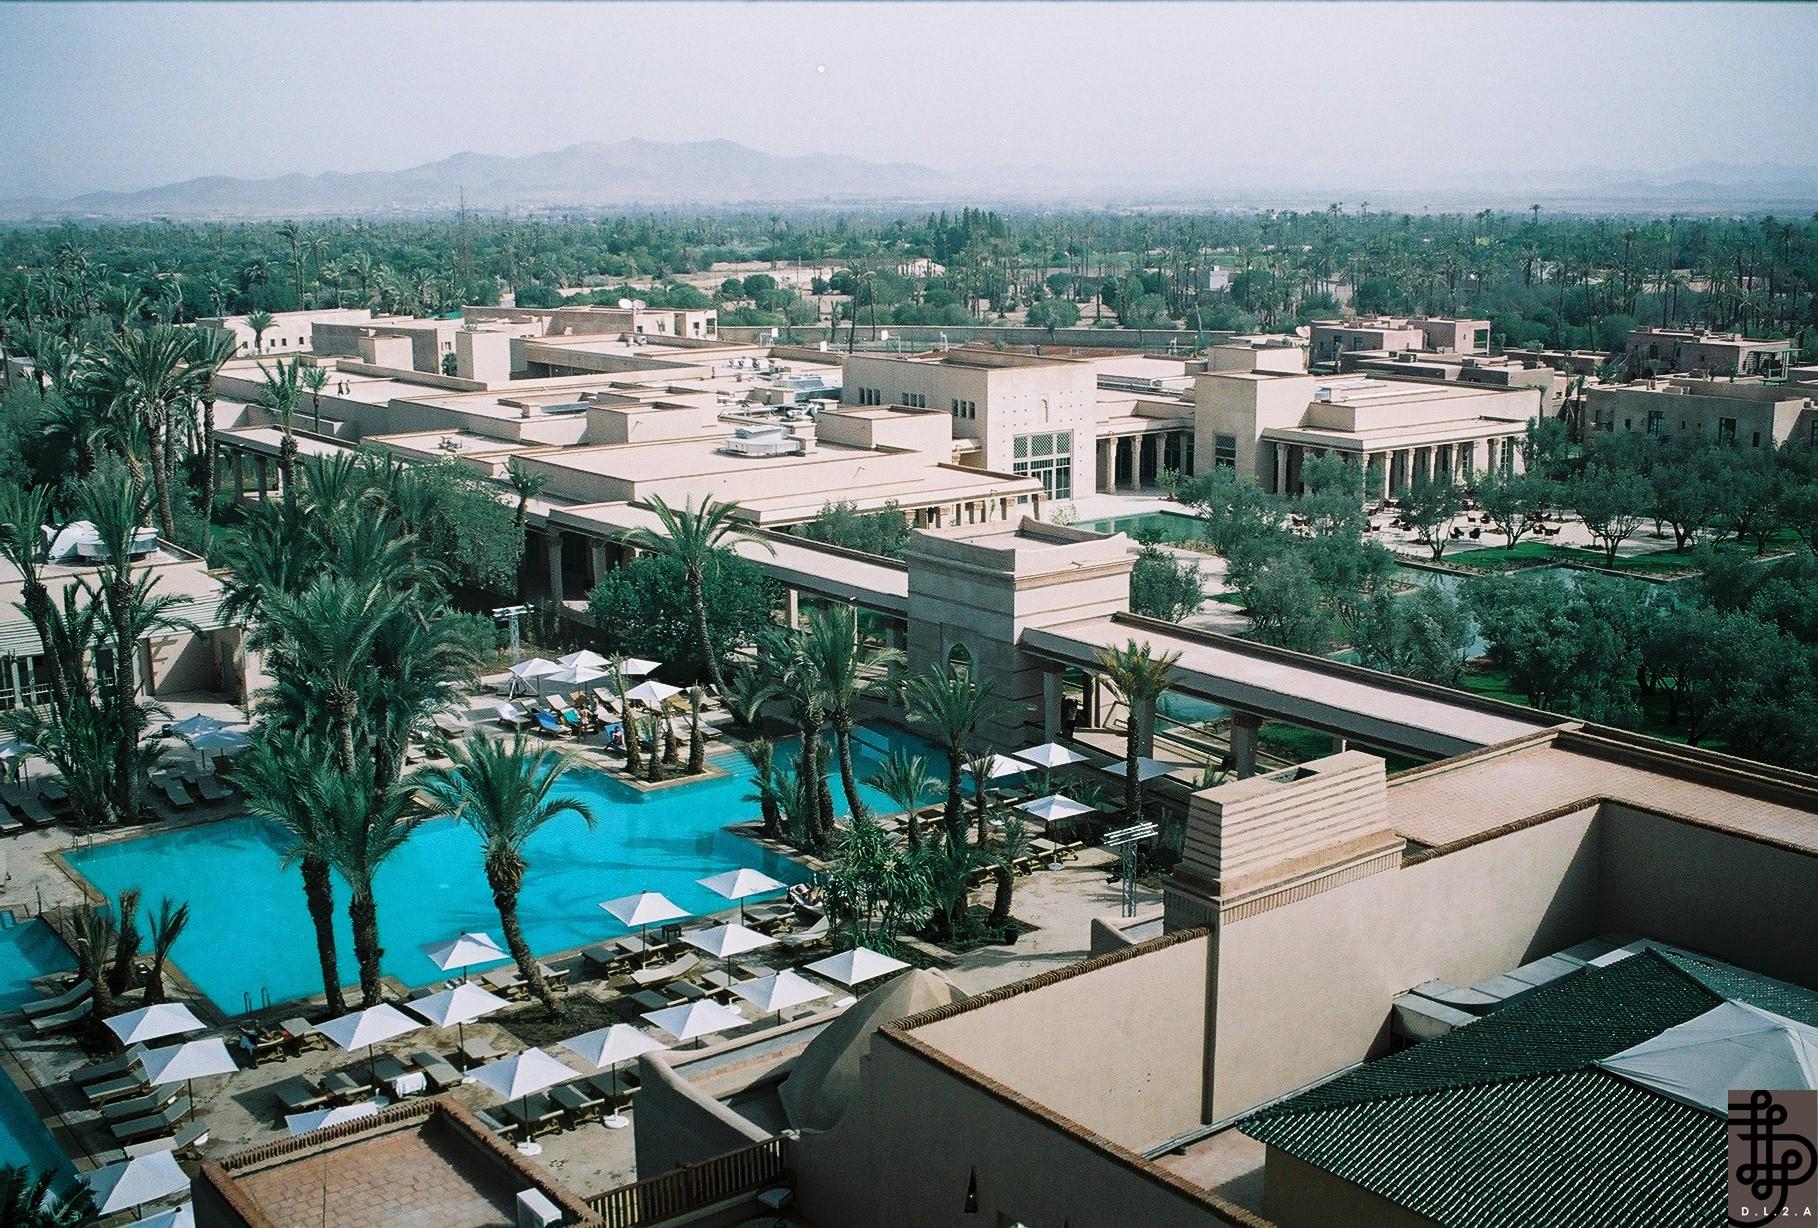 Photo Club Med Marrakech la Palmeraie File:dl2a Club Med Marrakech